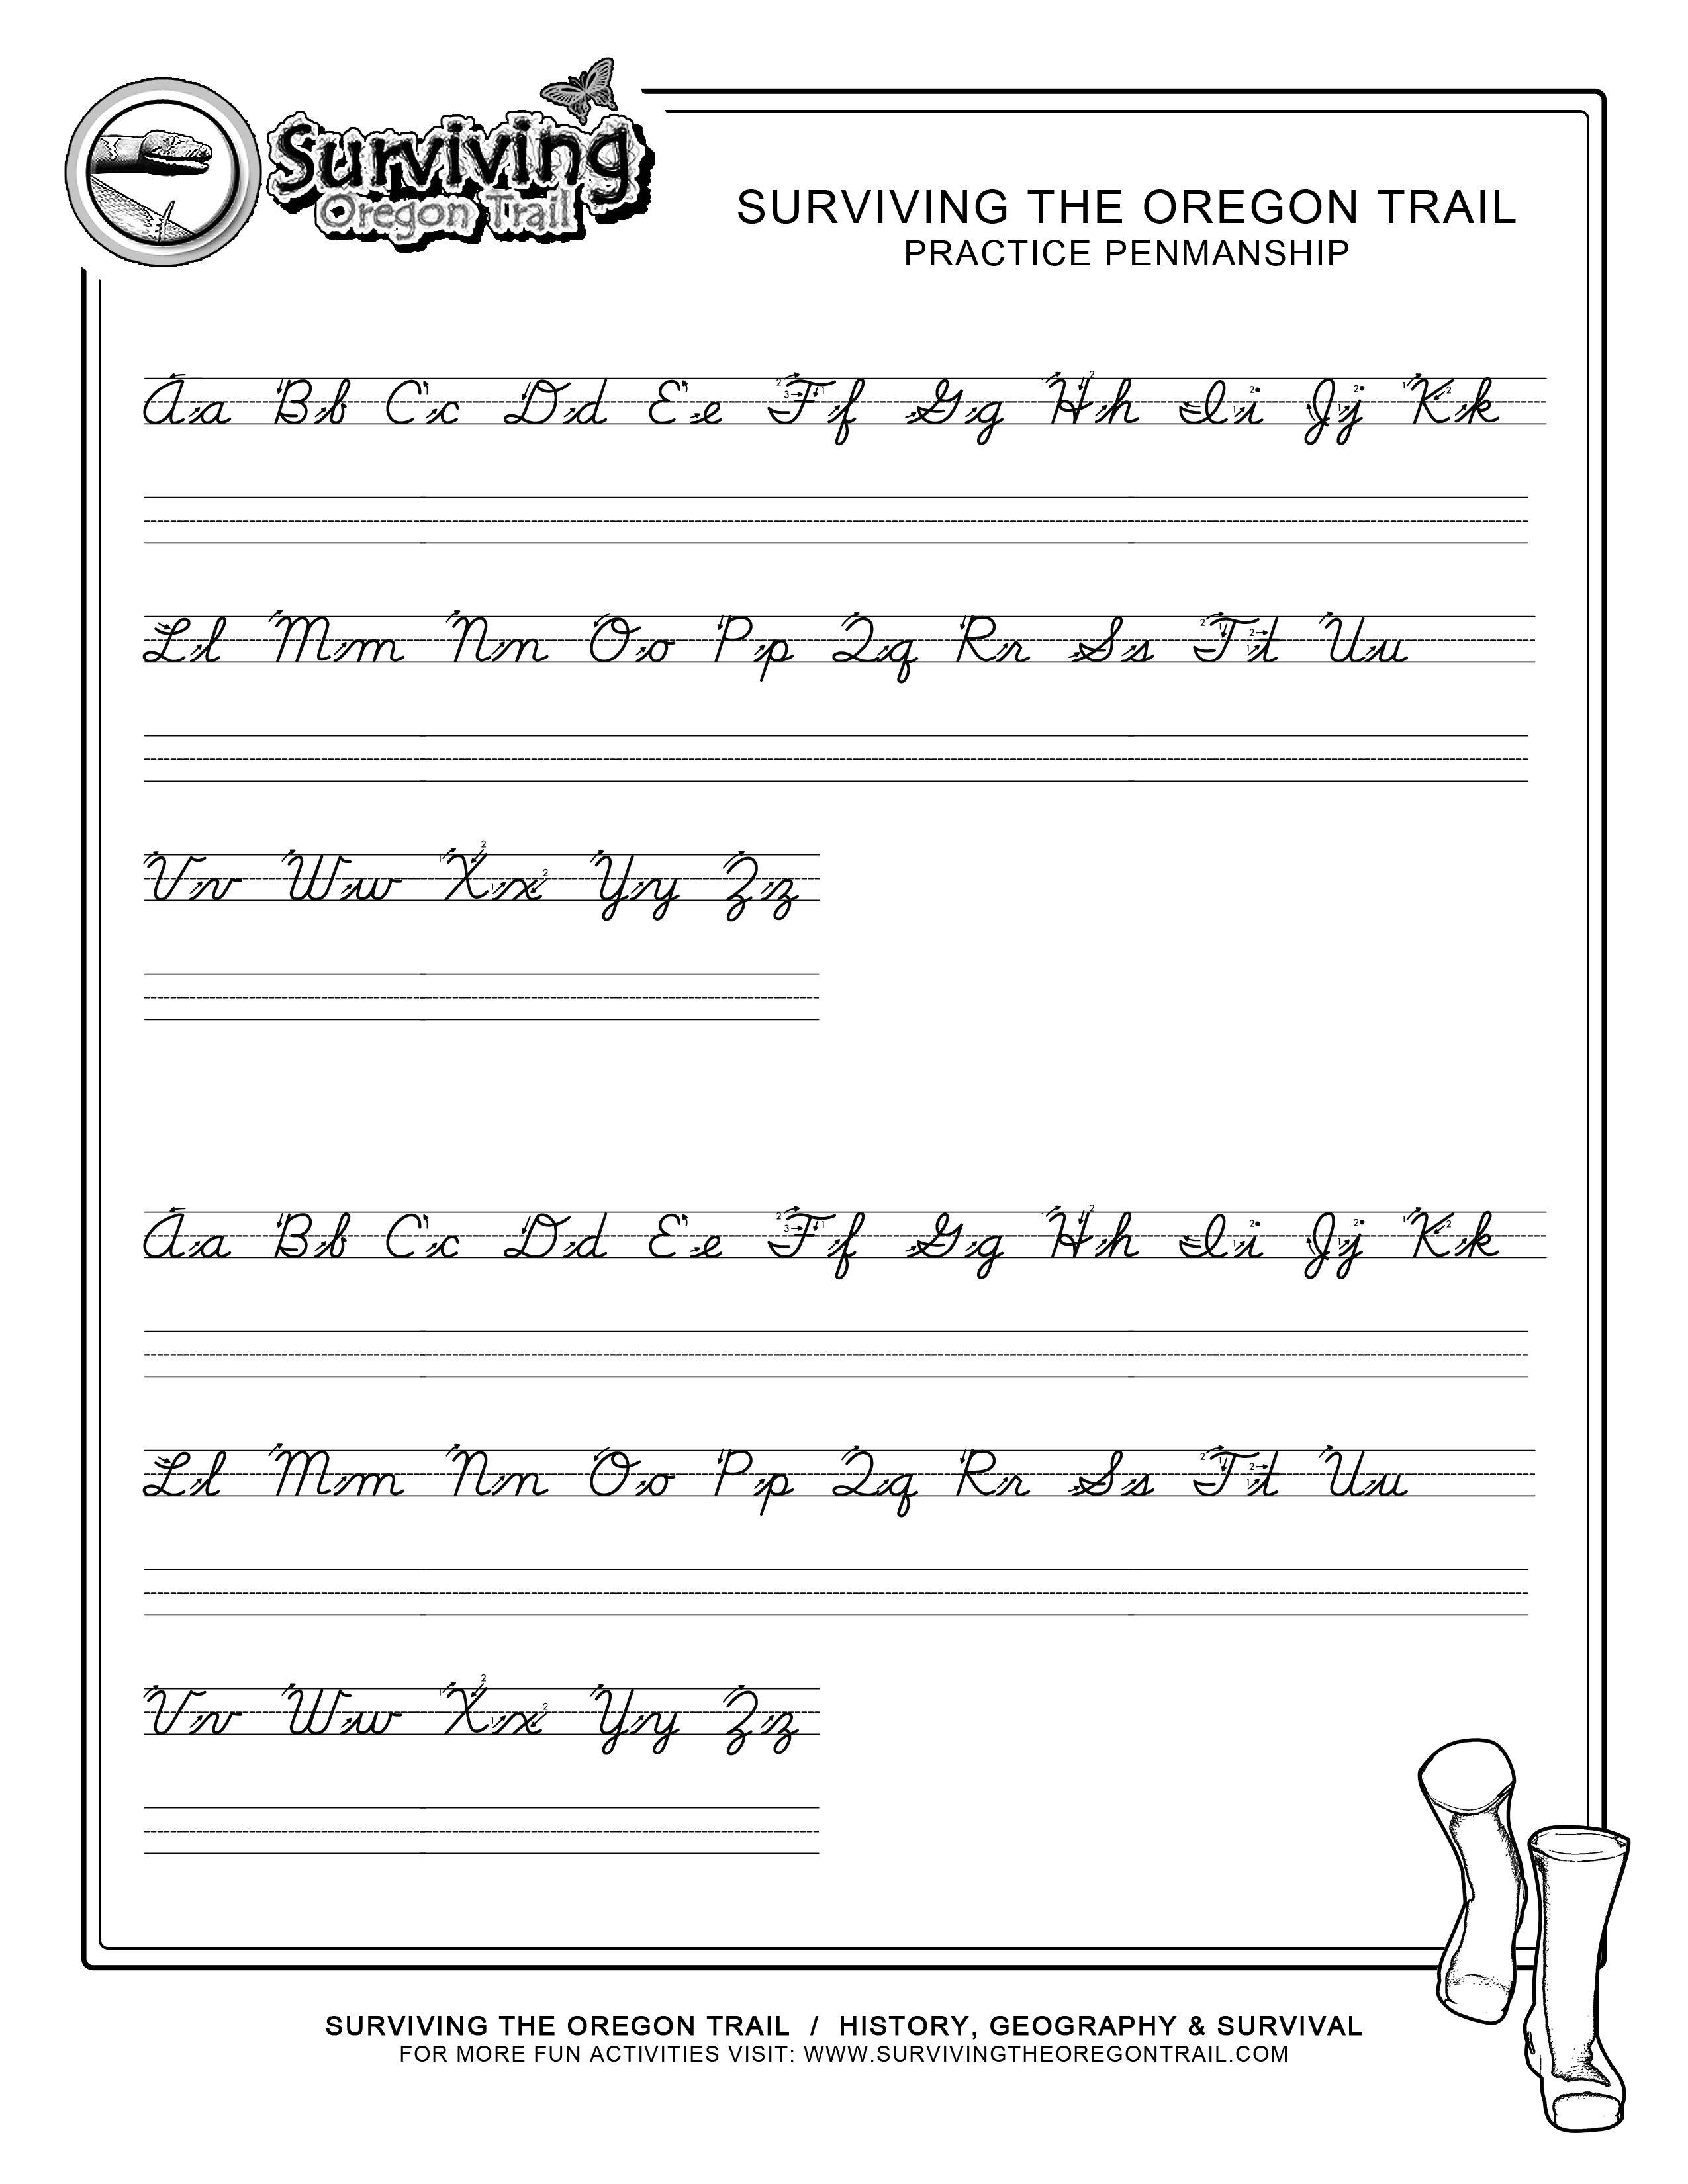 Practice Penmanship – Free Abc's Printable Cursive Writing Worksheet | Free Printable Writing Worksheets